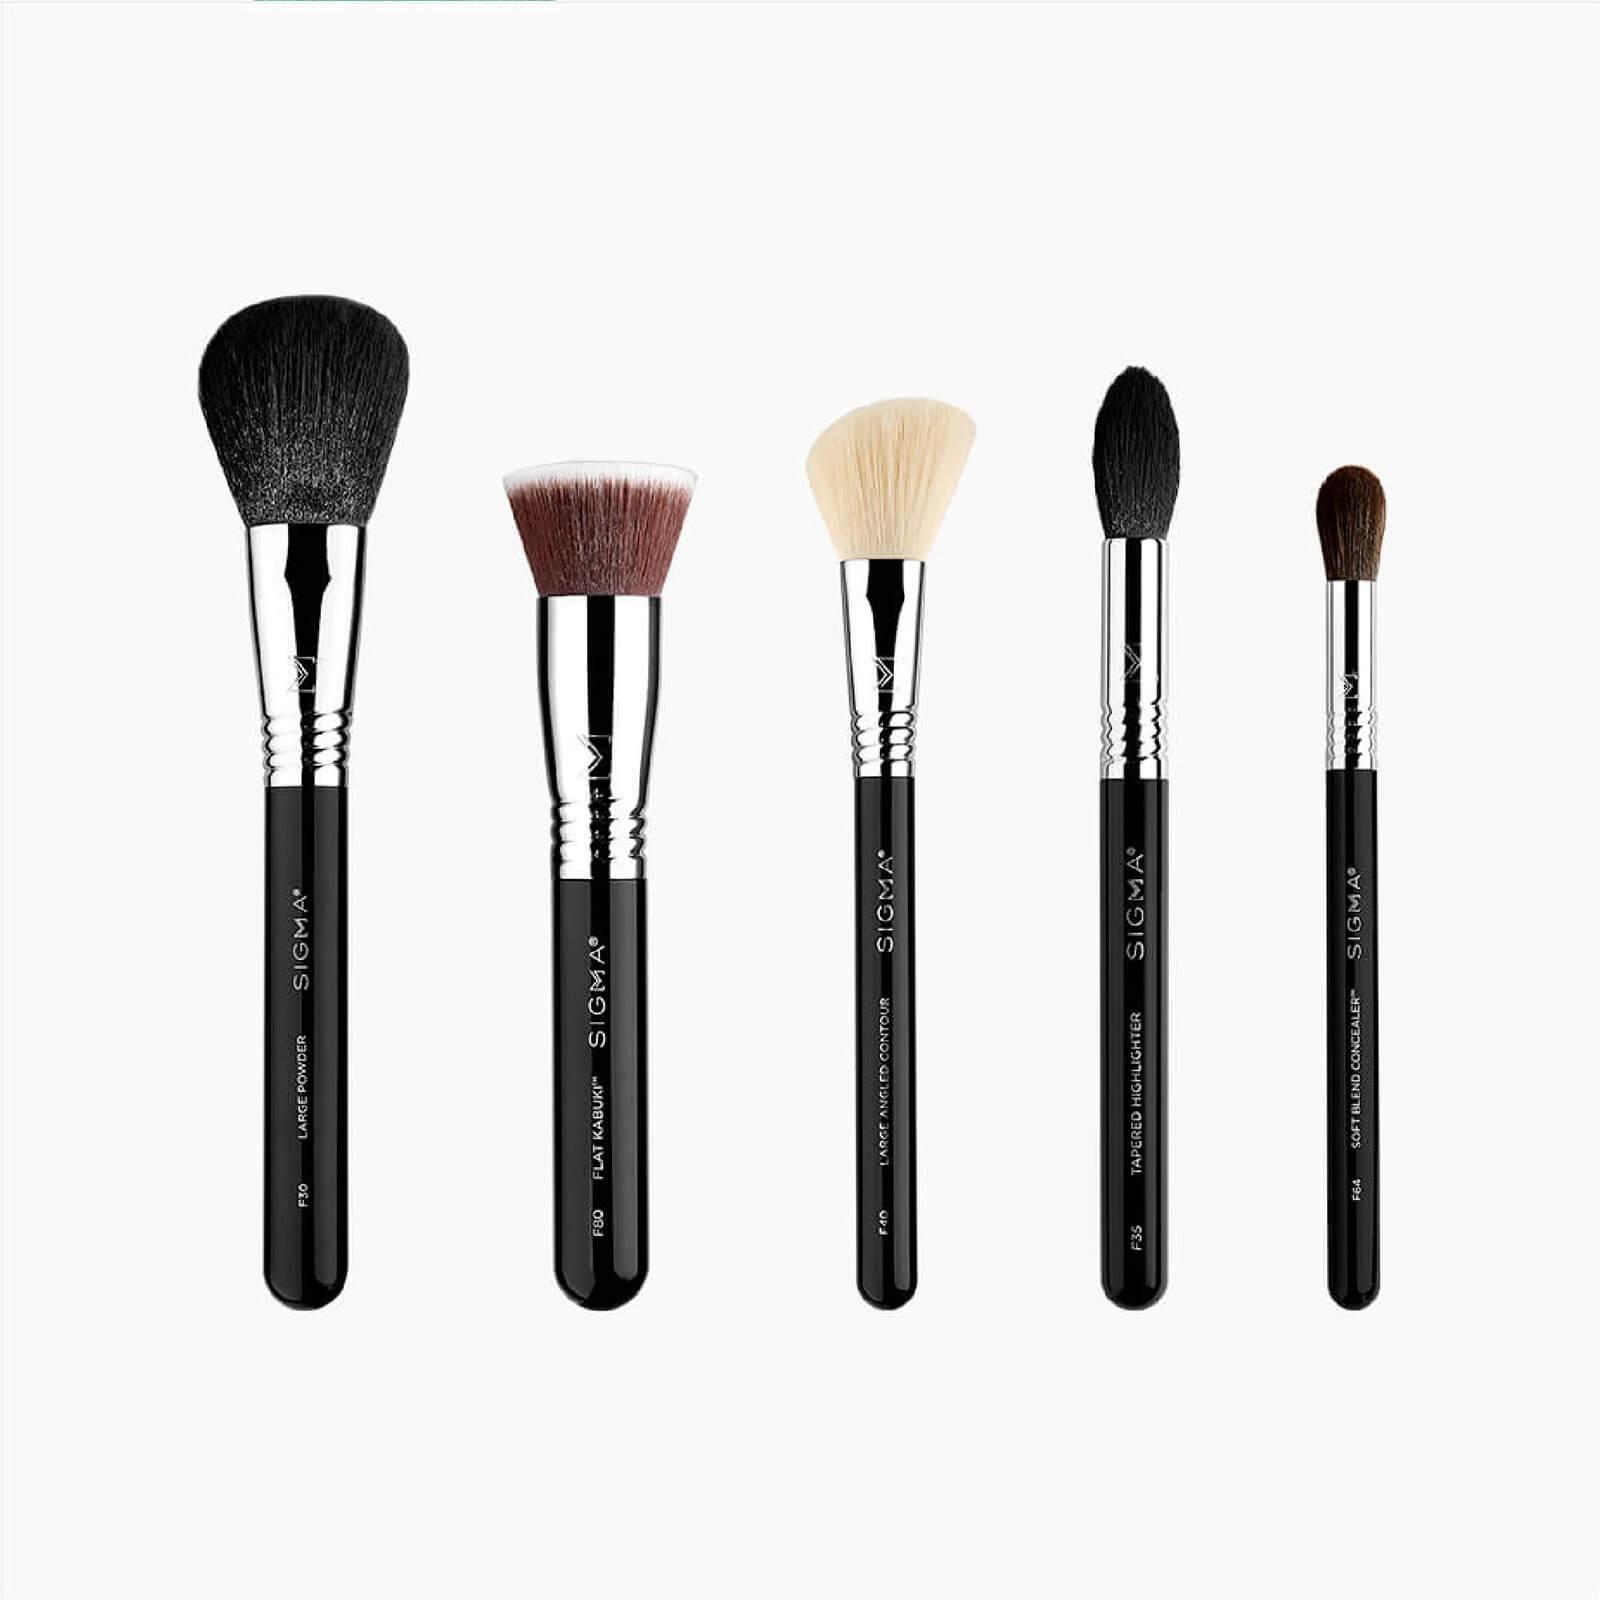 Sigma Classic Face Brush Set (Worth £100.63)